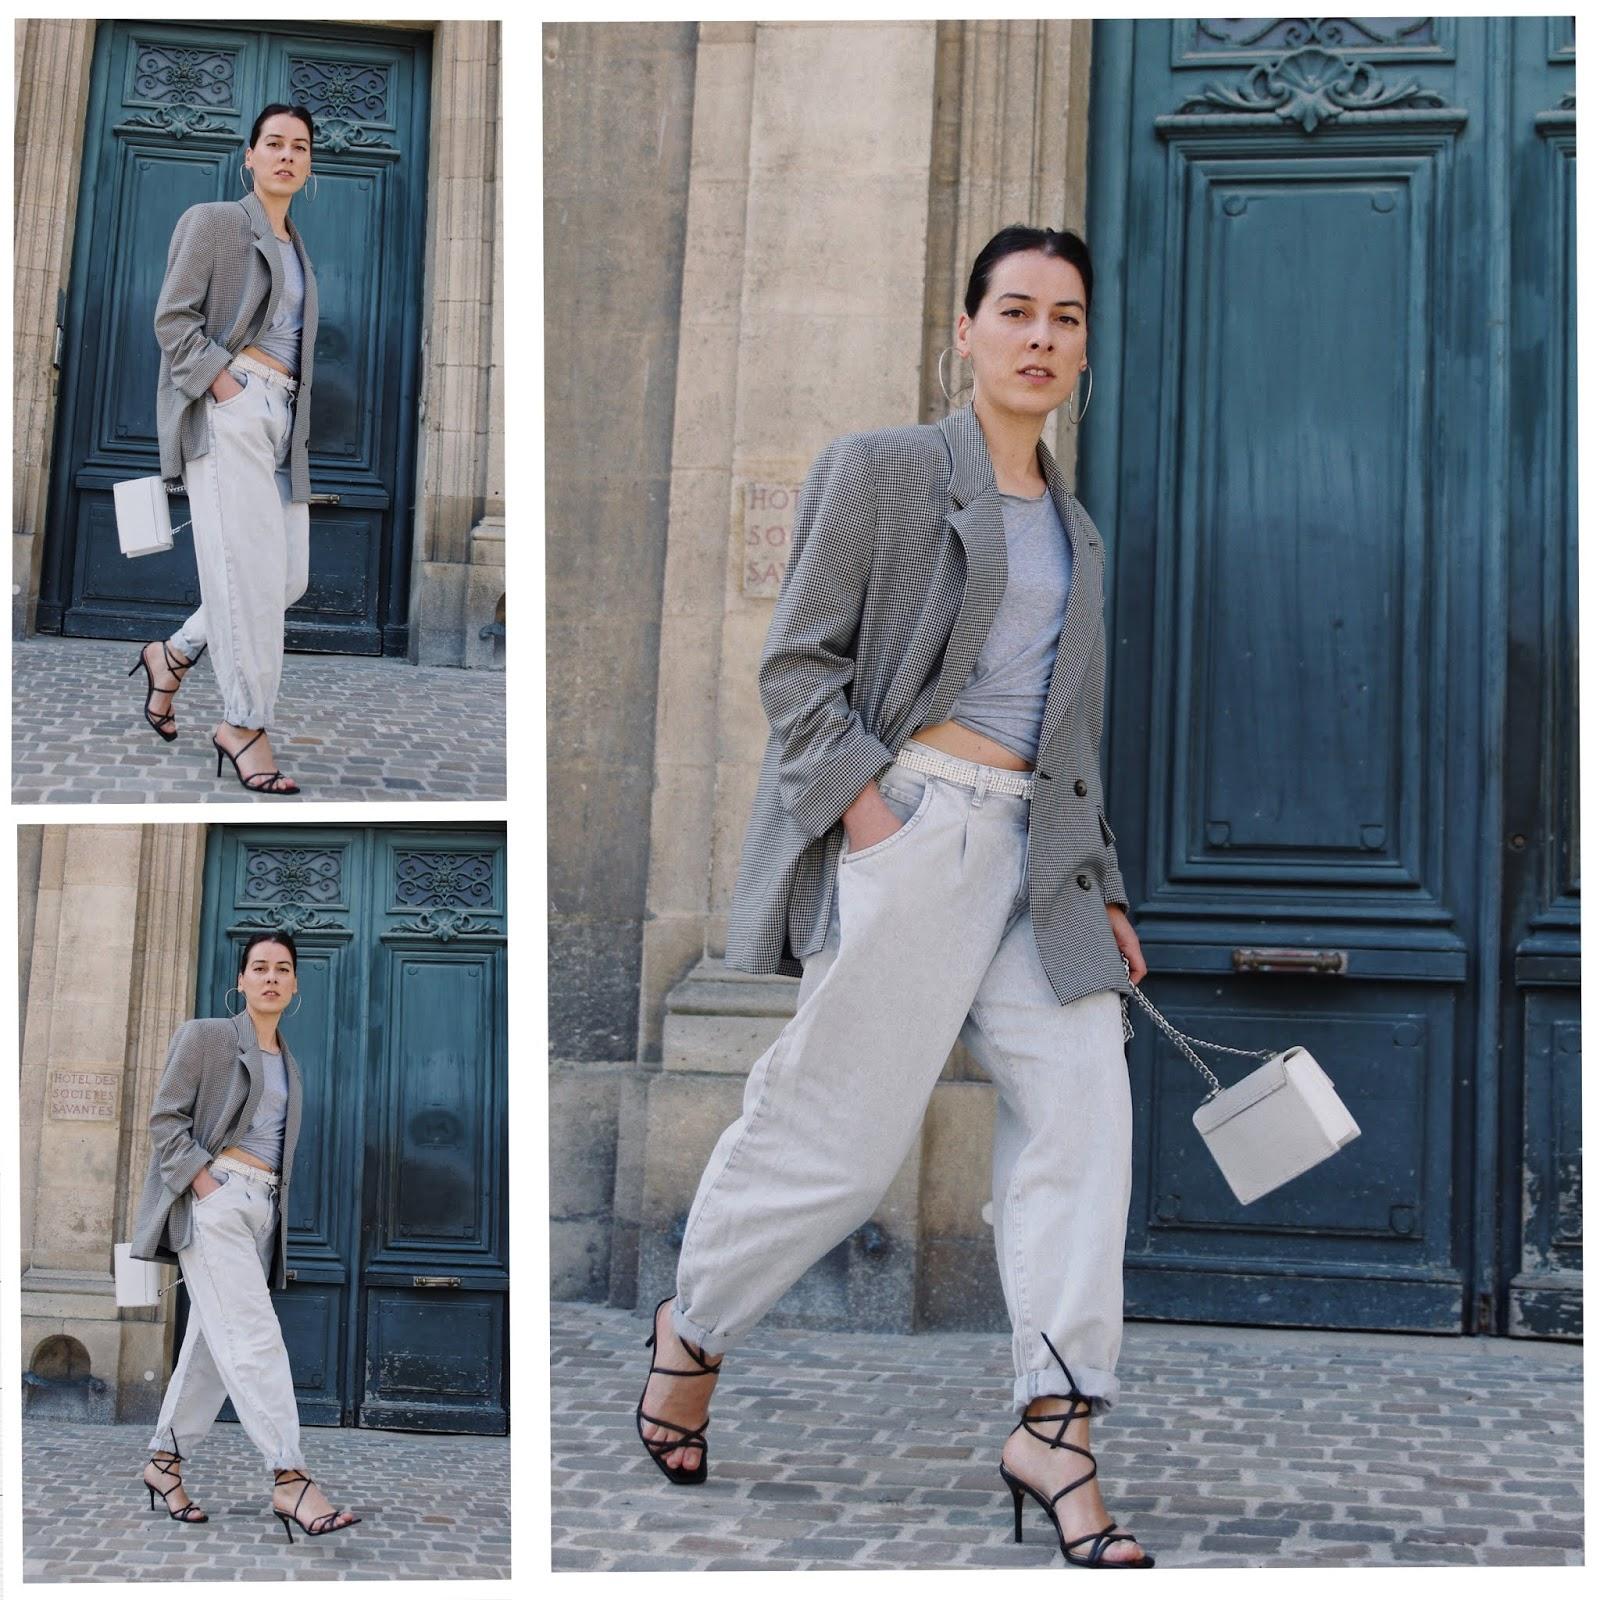 idée de look printemps été 2019,blazer oversize,pantalon oversize, crop top